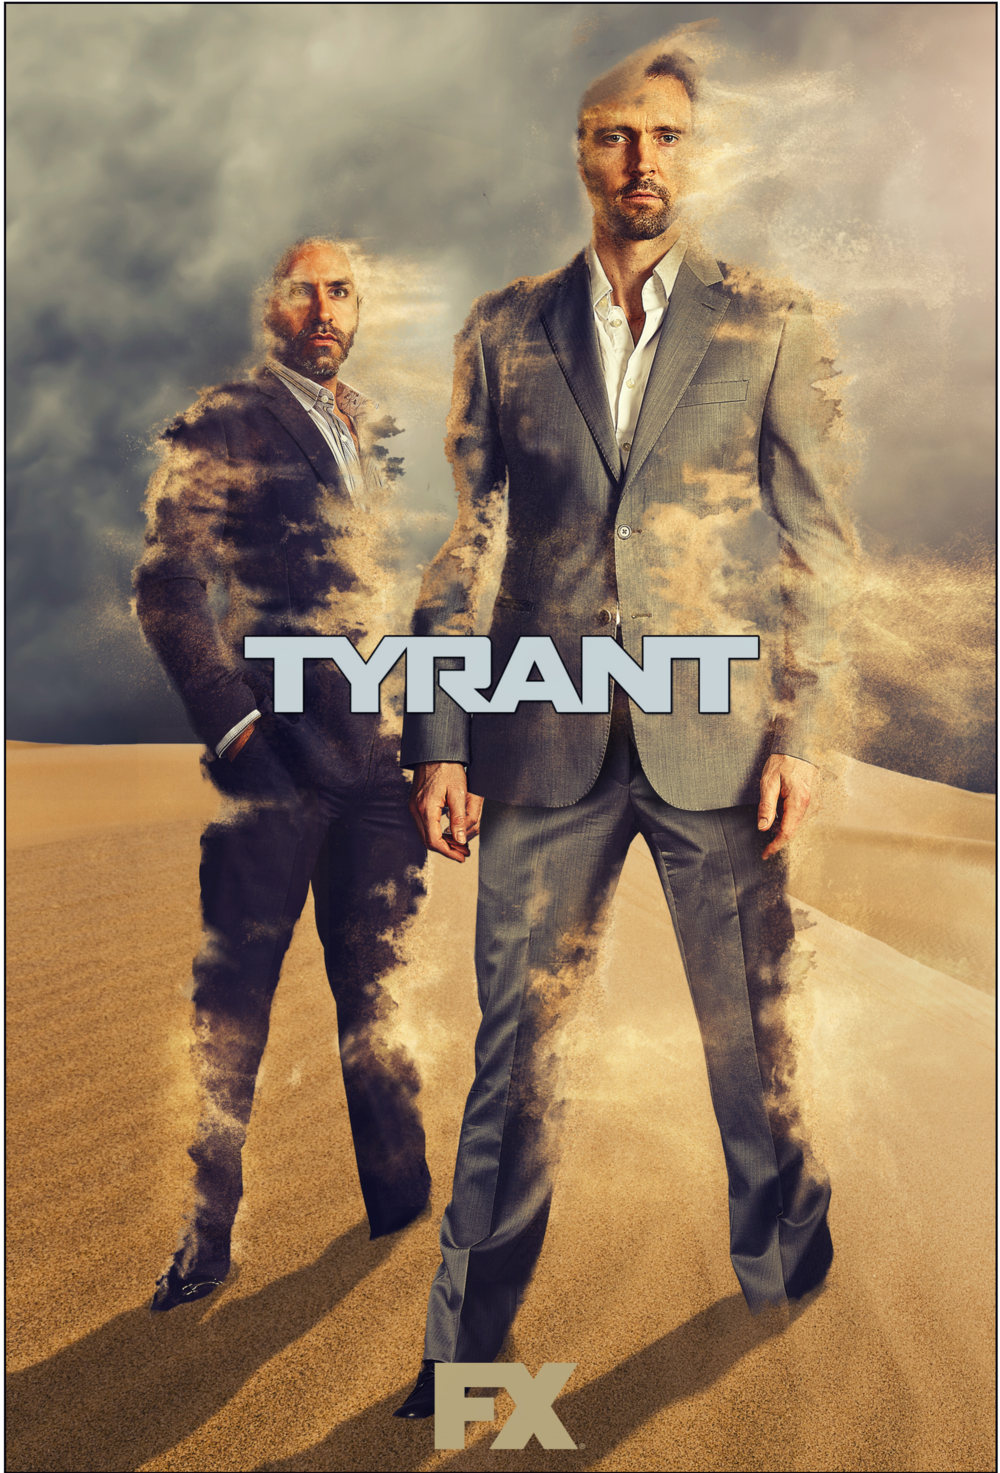 009_tyrant2_1sht_es00 copy.jpg